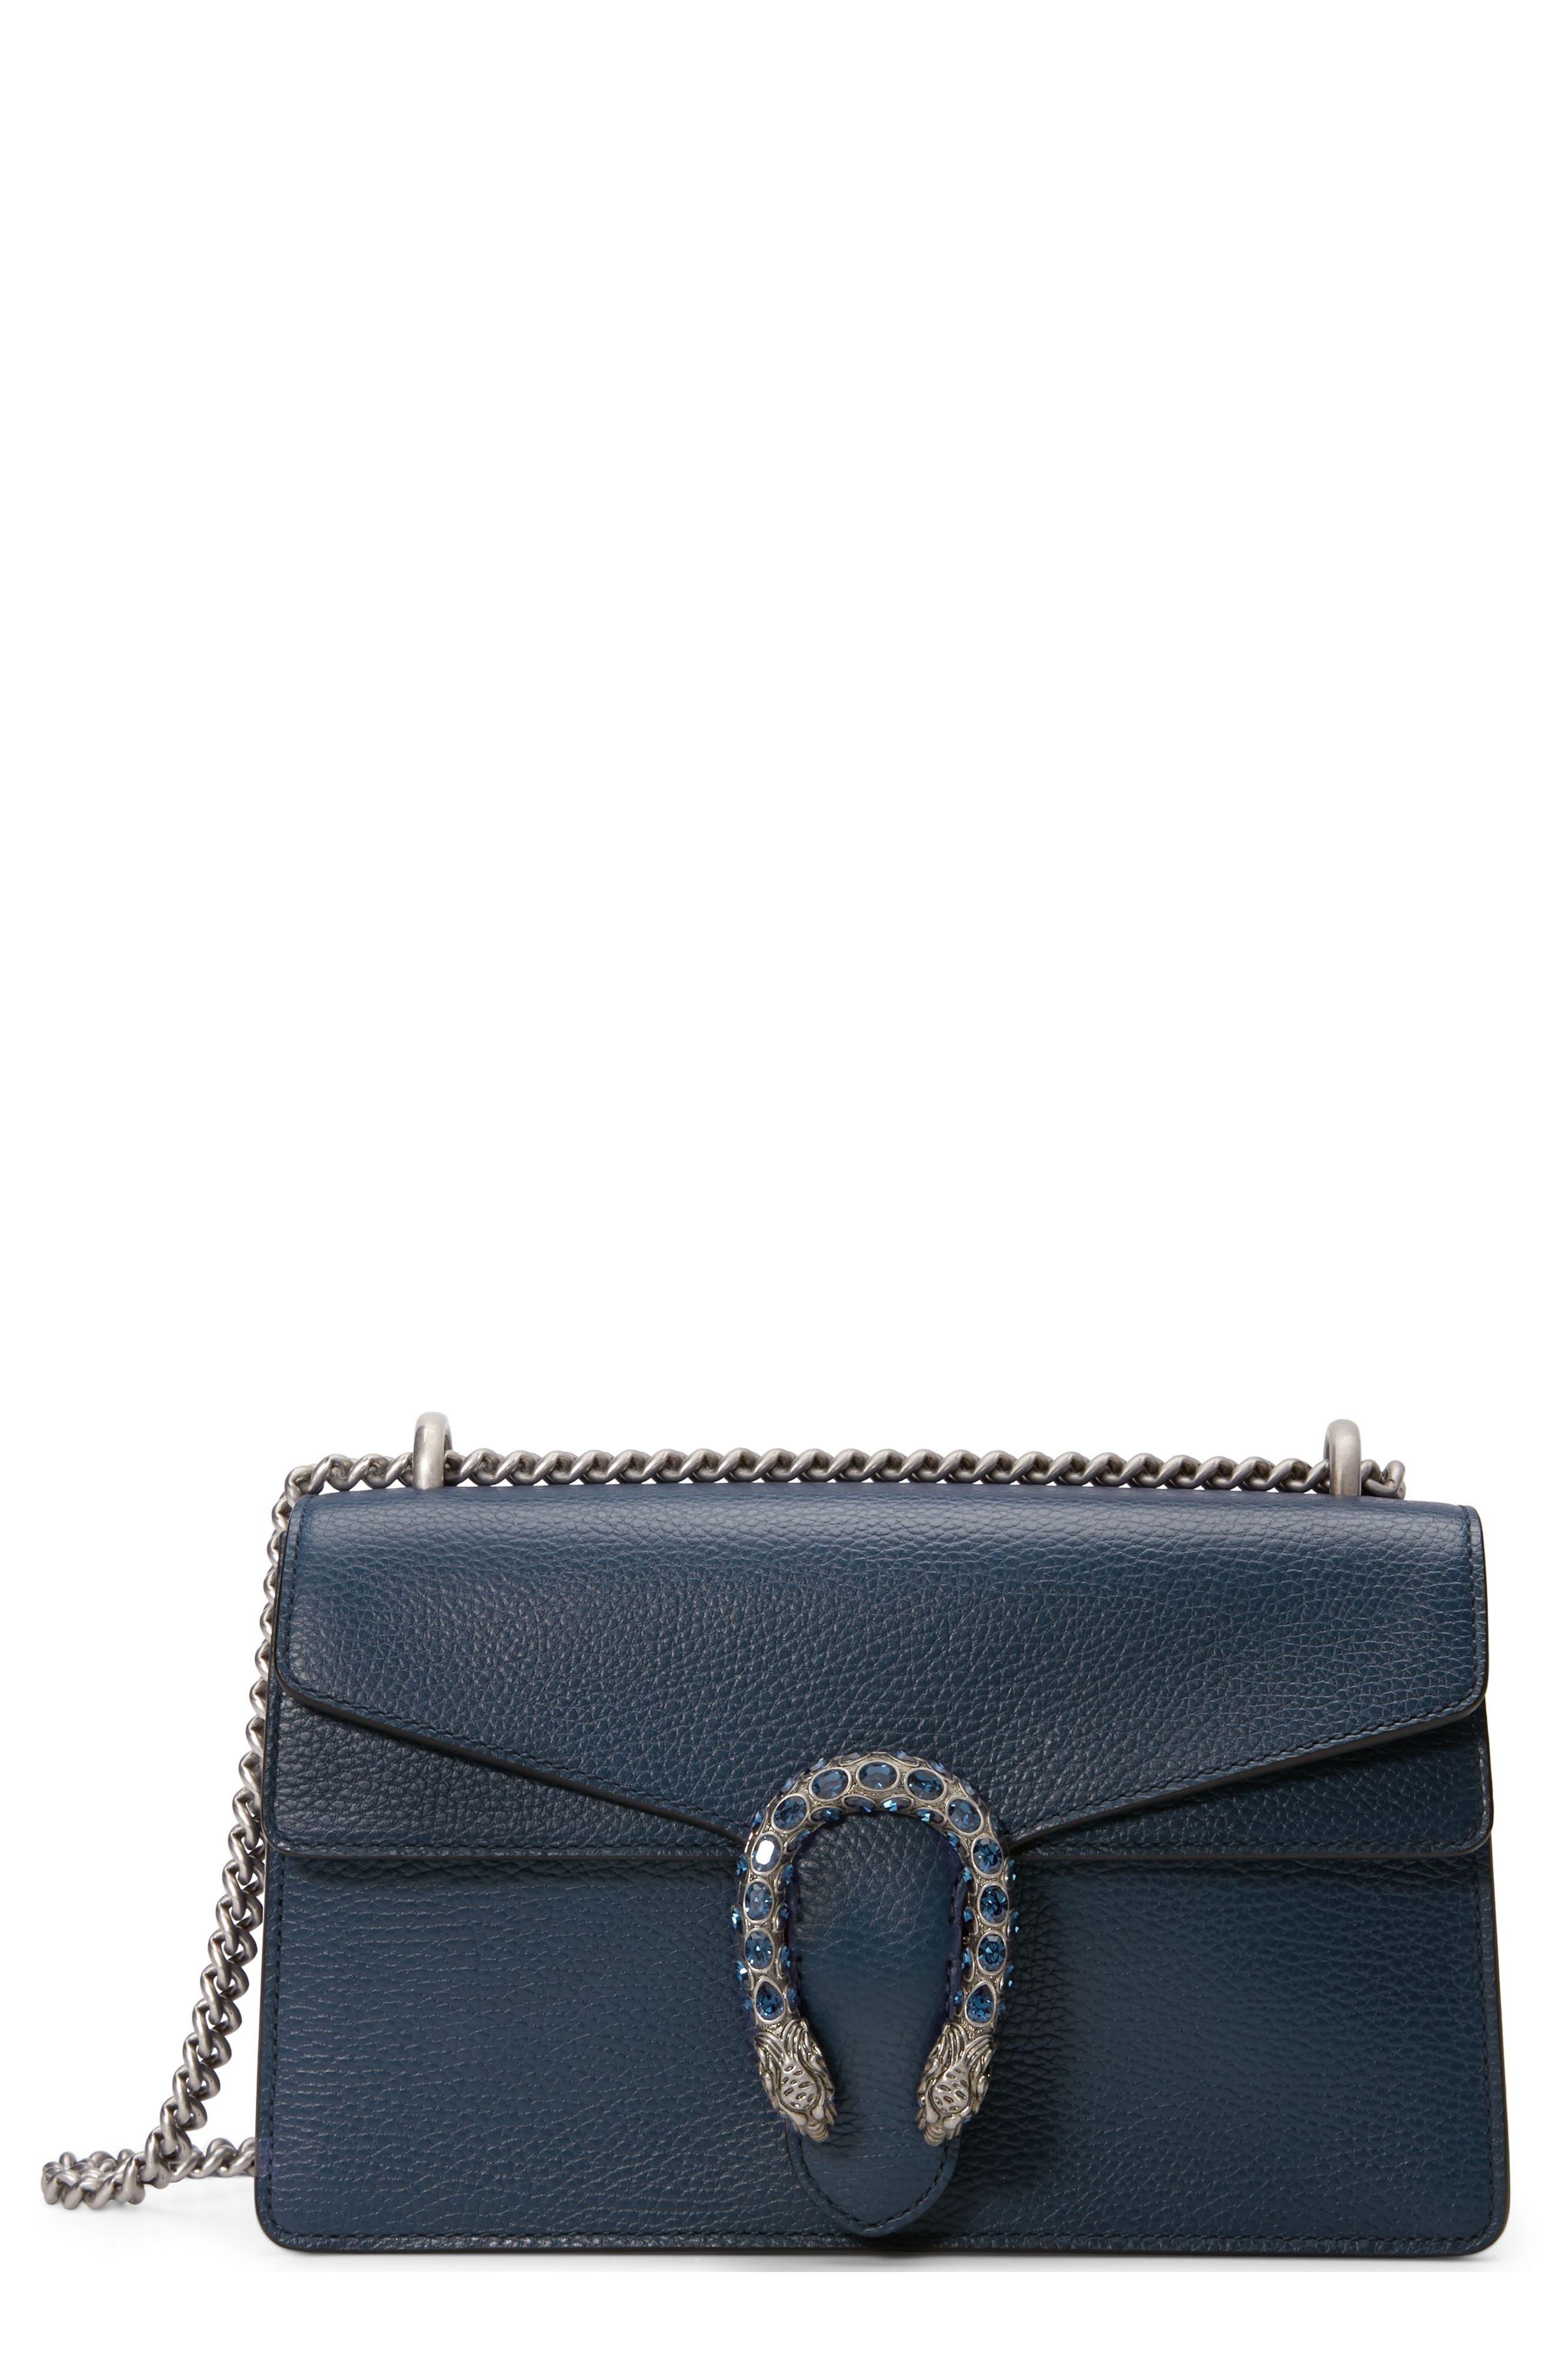 Small Dionysus Leather Shoulder Bag,                             Main thumbnail 1, color,                             BLU AGATA/ MONTANA